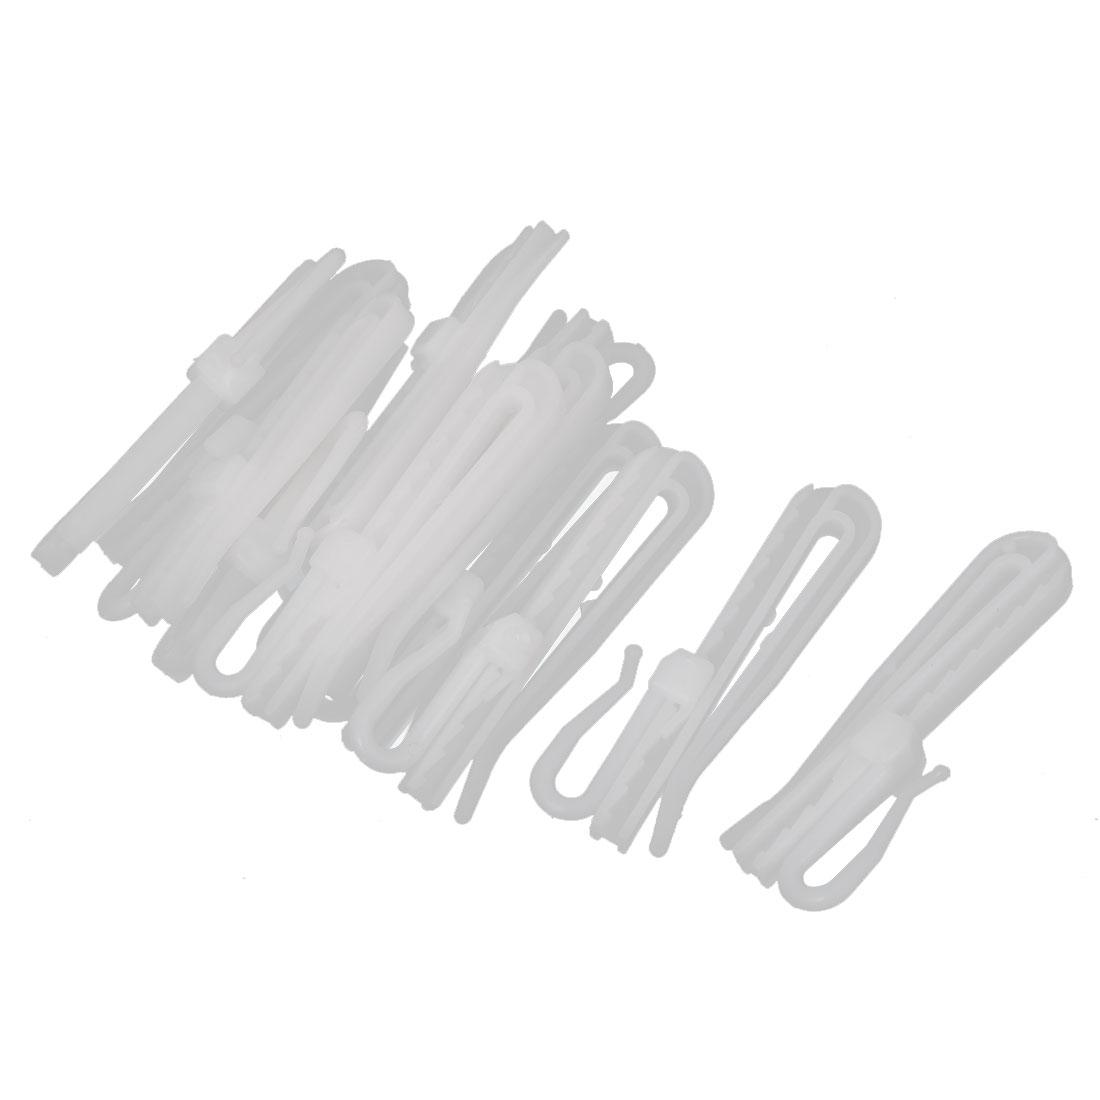 12pcs 7cm Length White Plastic Window Curtain Adjustable Hooks Hangers Clips